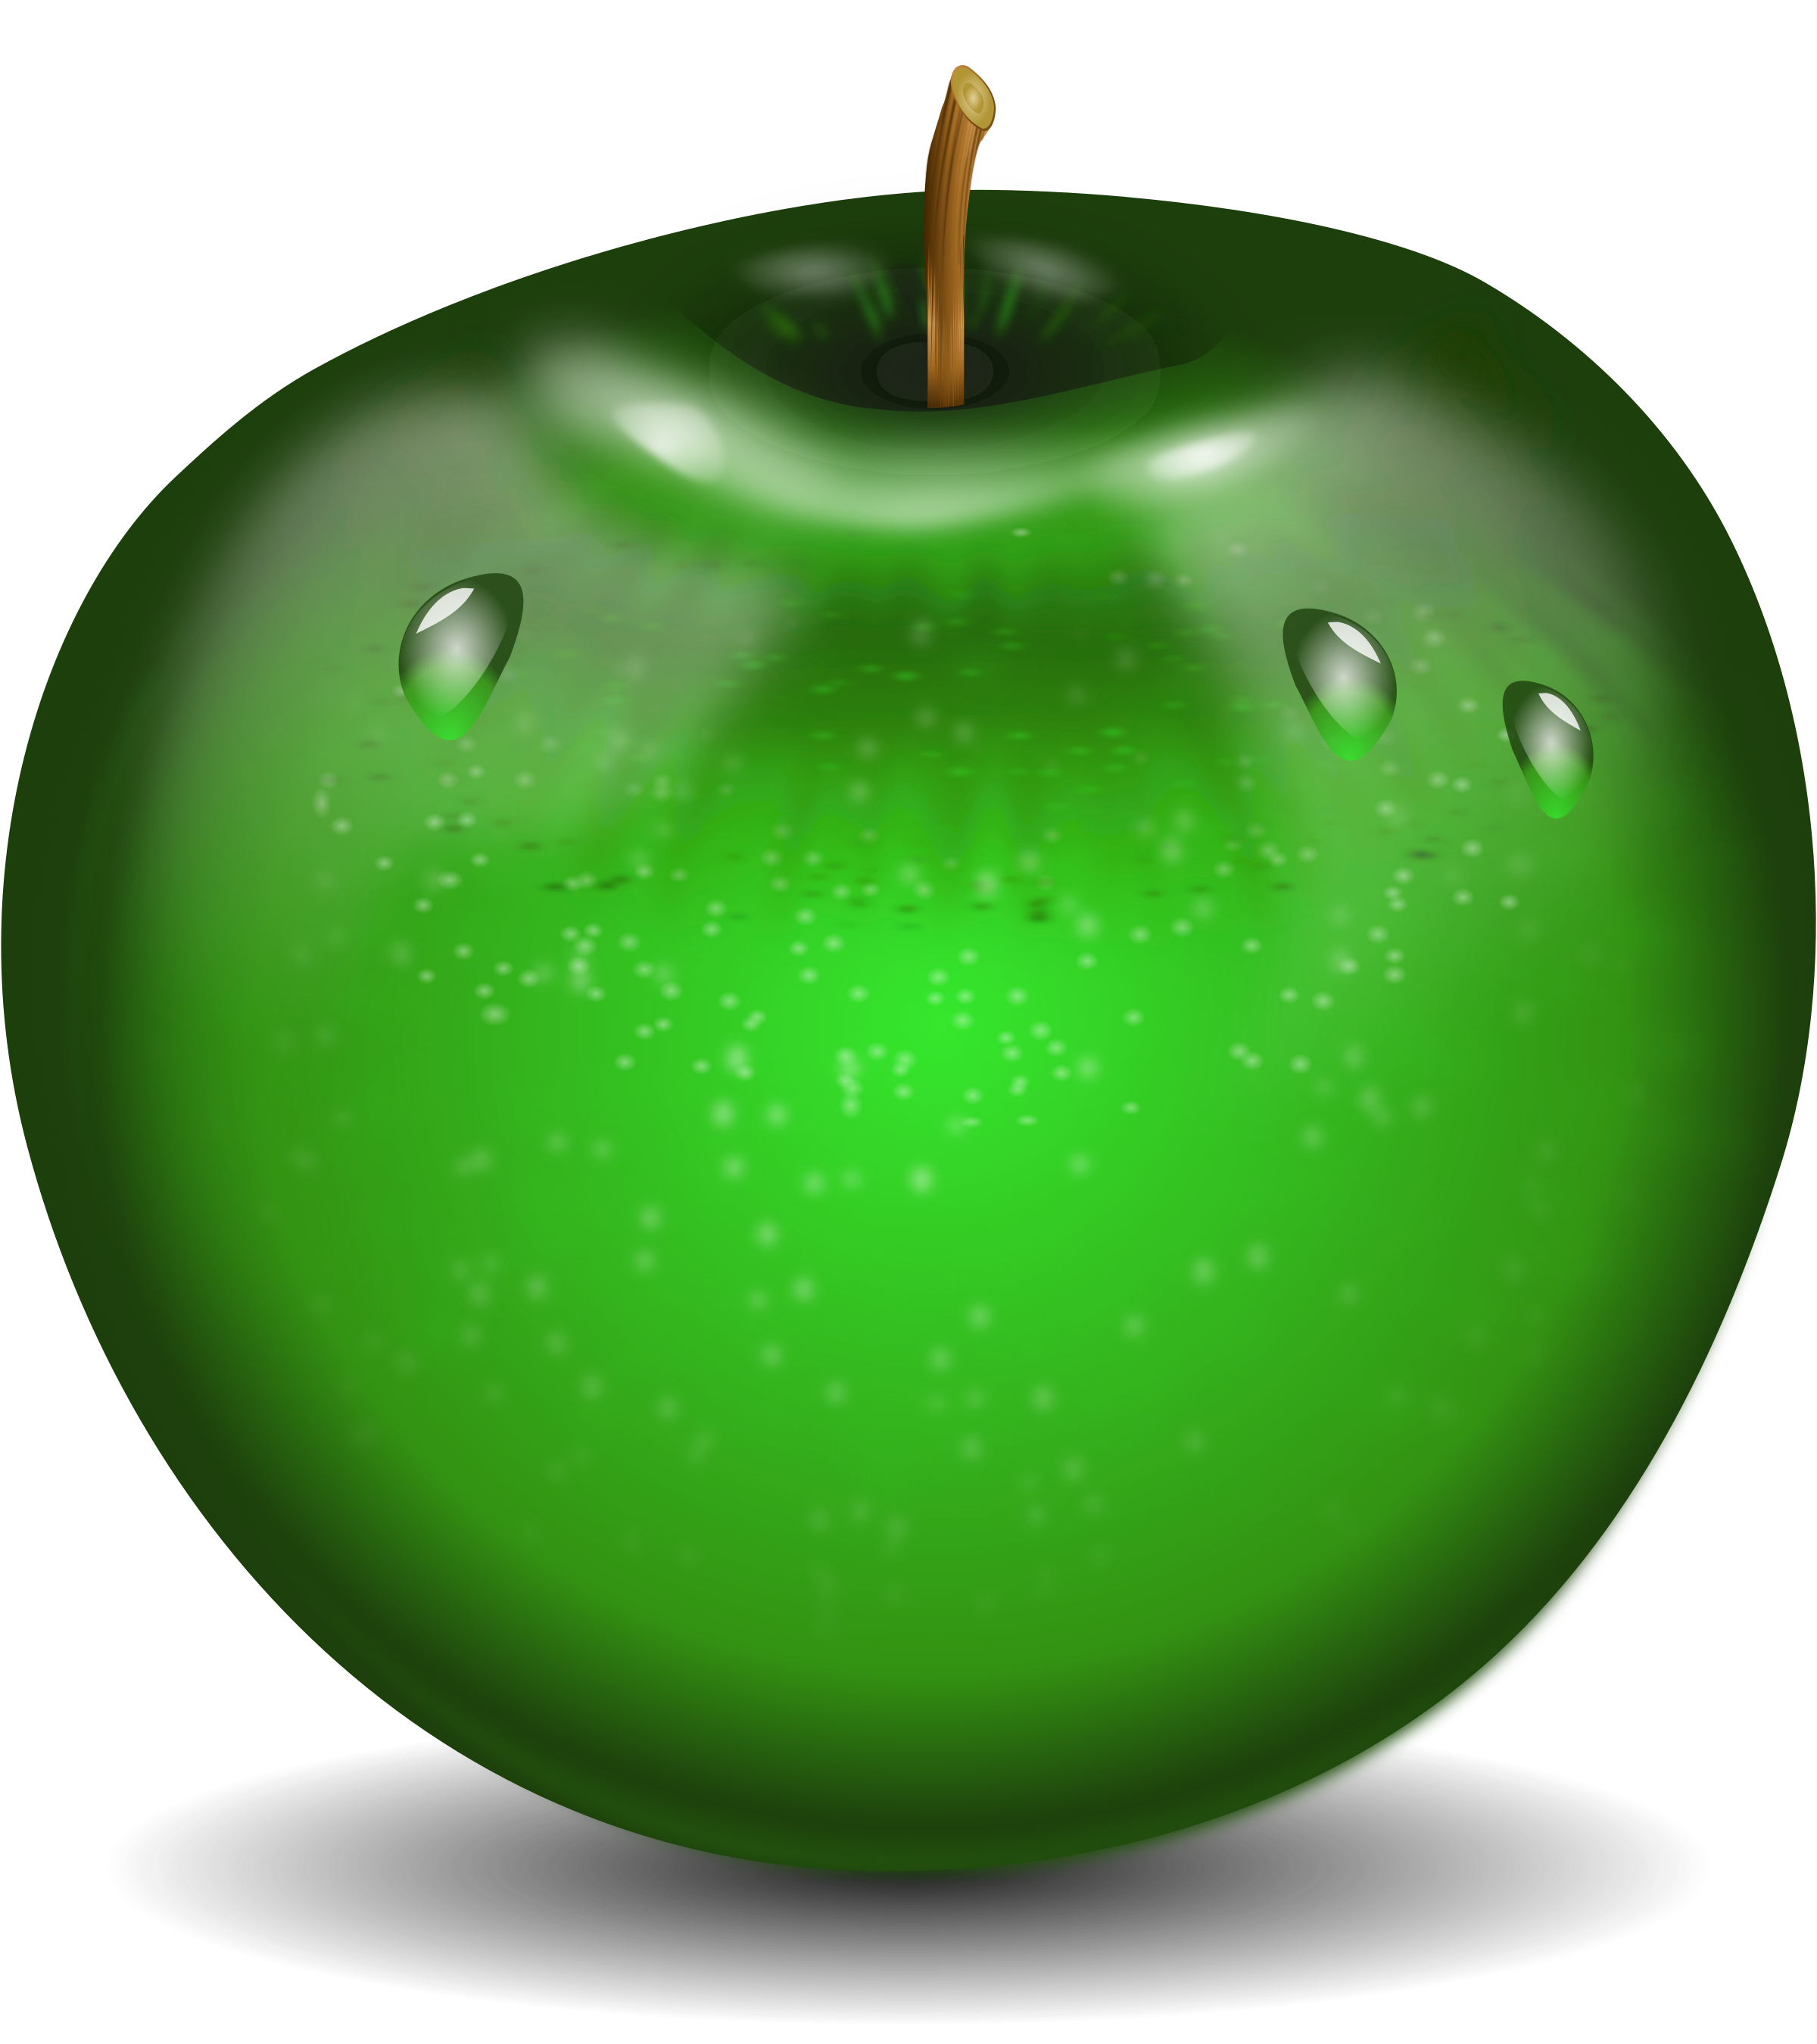 Green Apple S Apple Green Apple Fruit